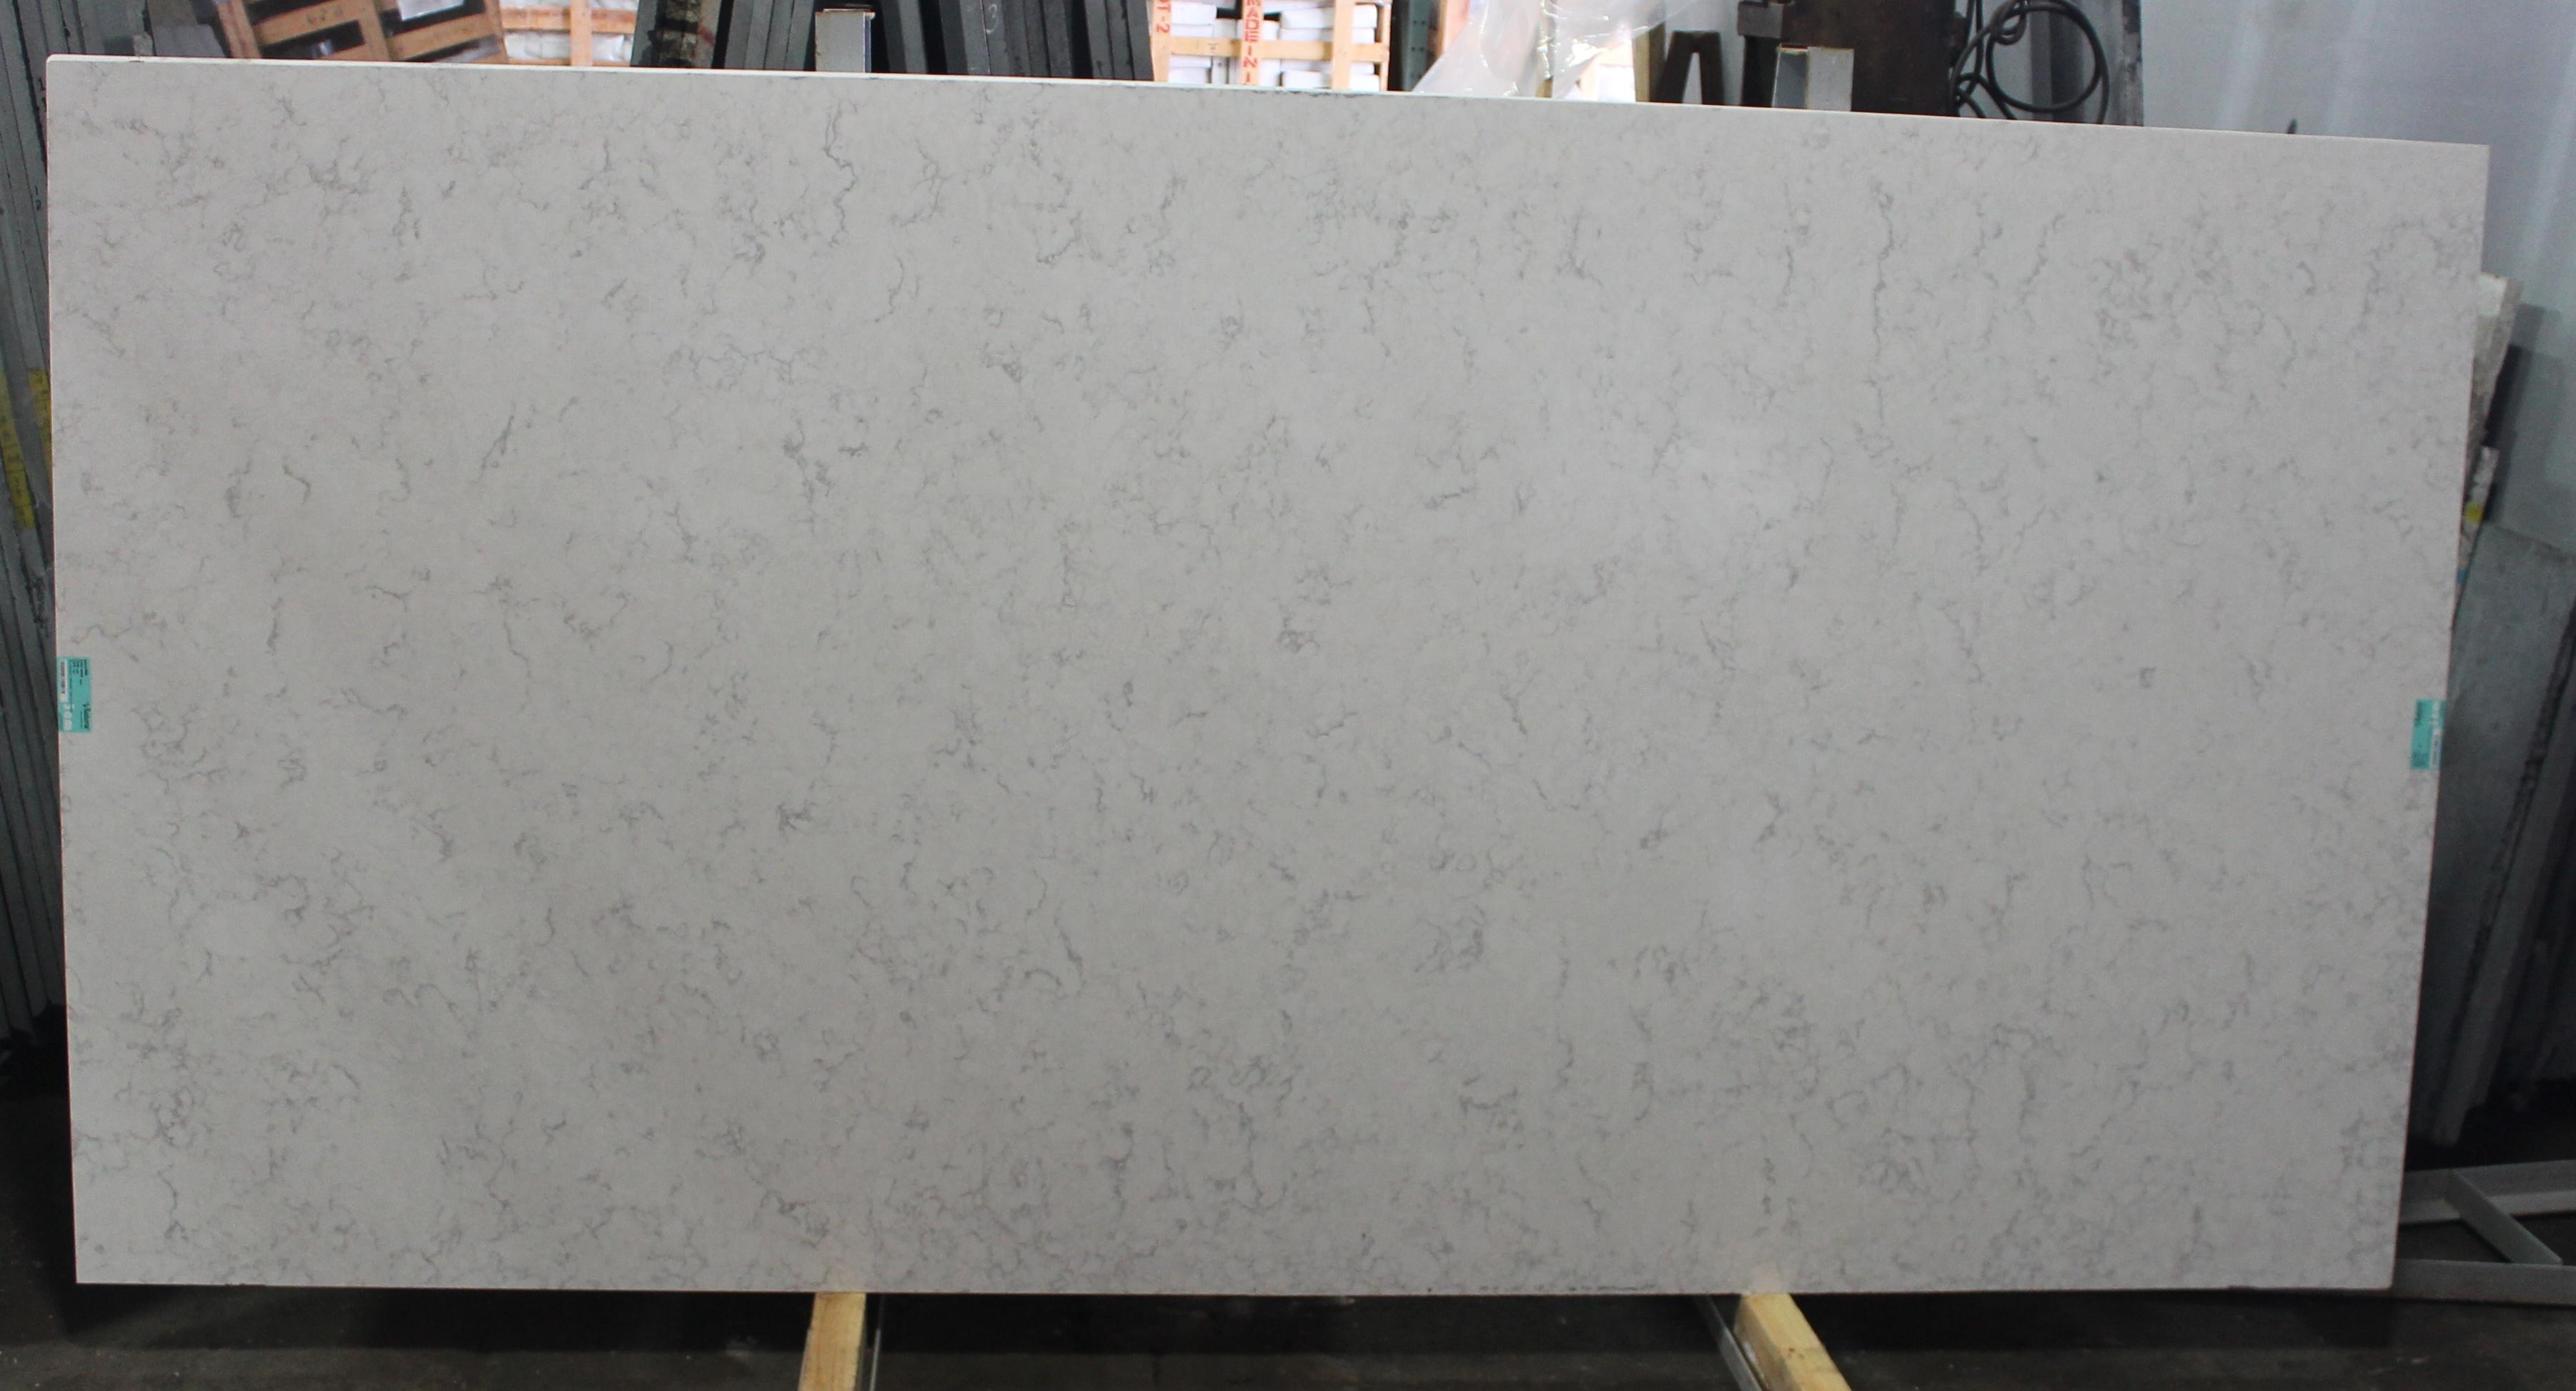 Minuet Earth Stone Amp Tile Inc